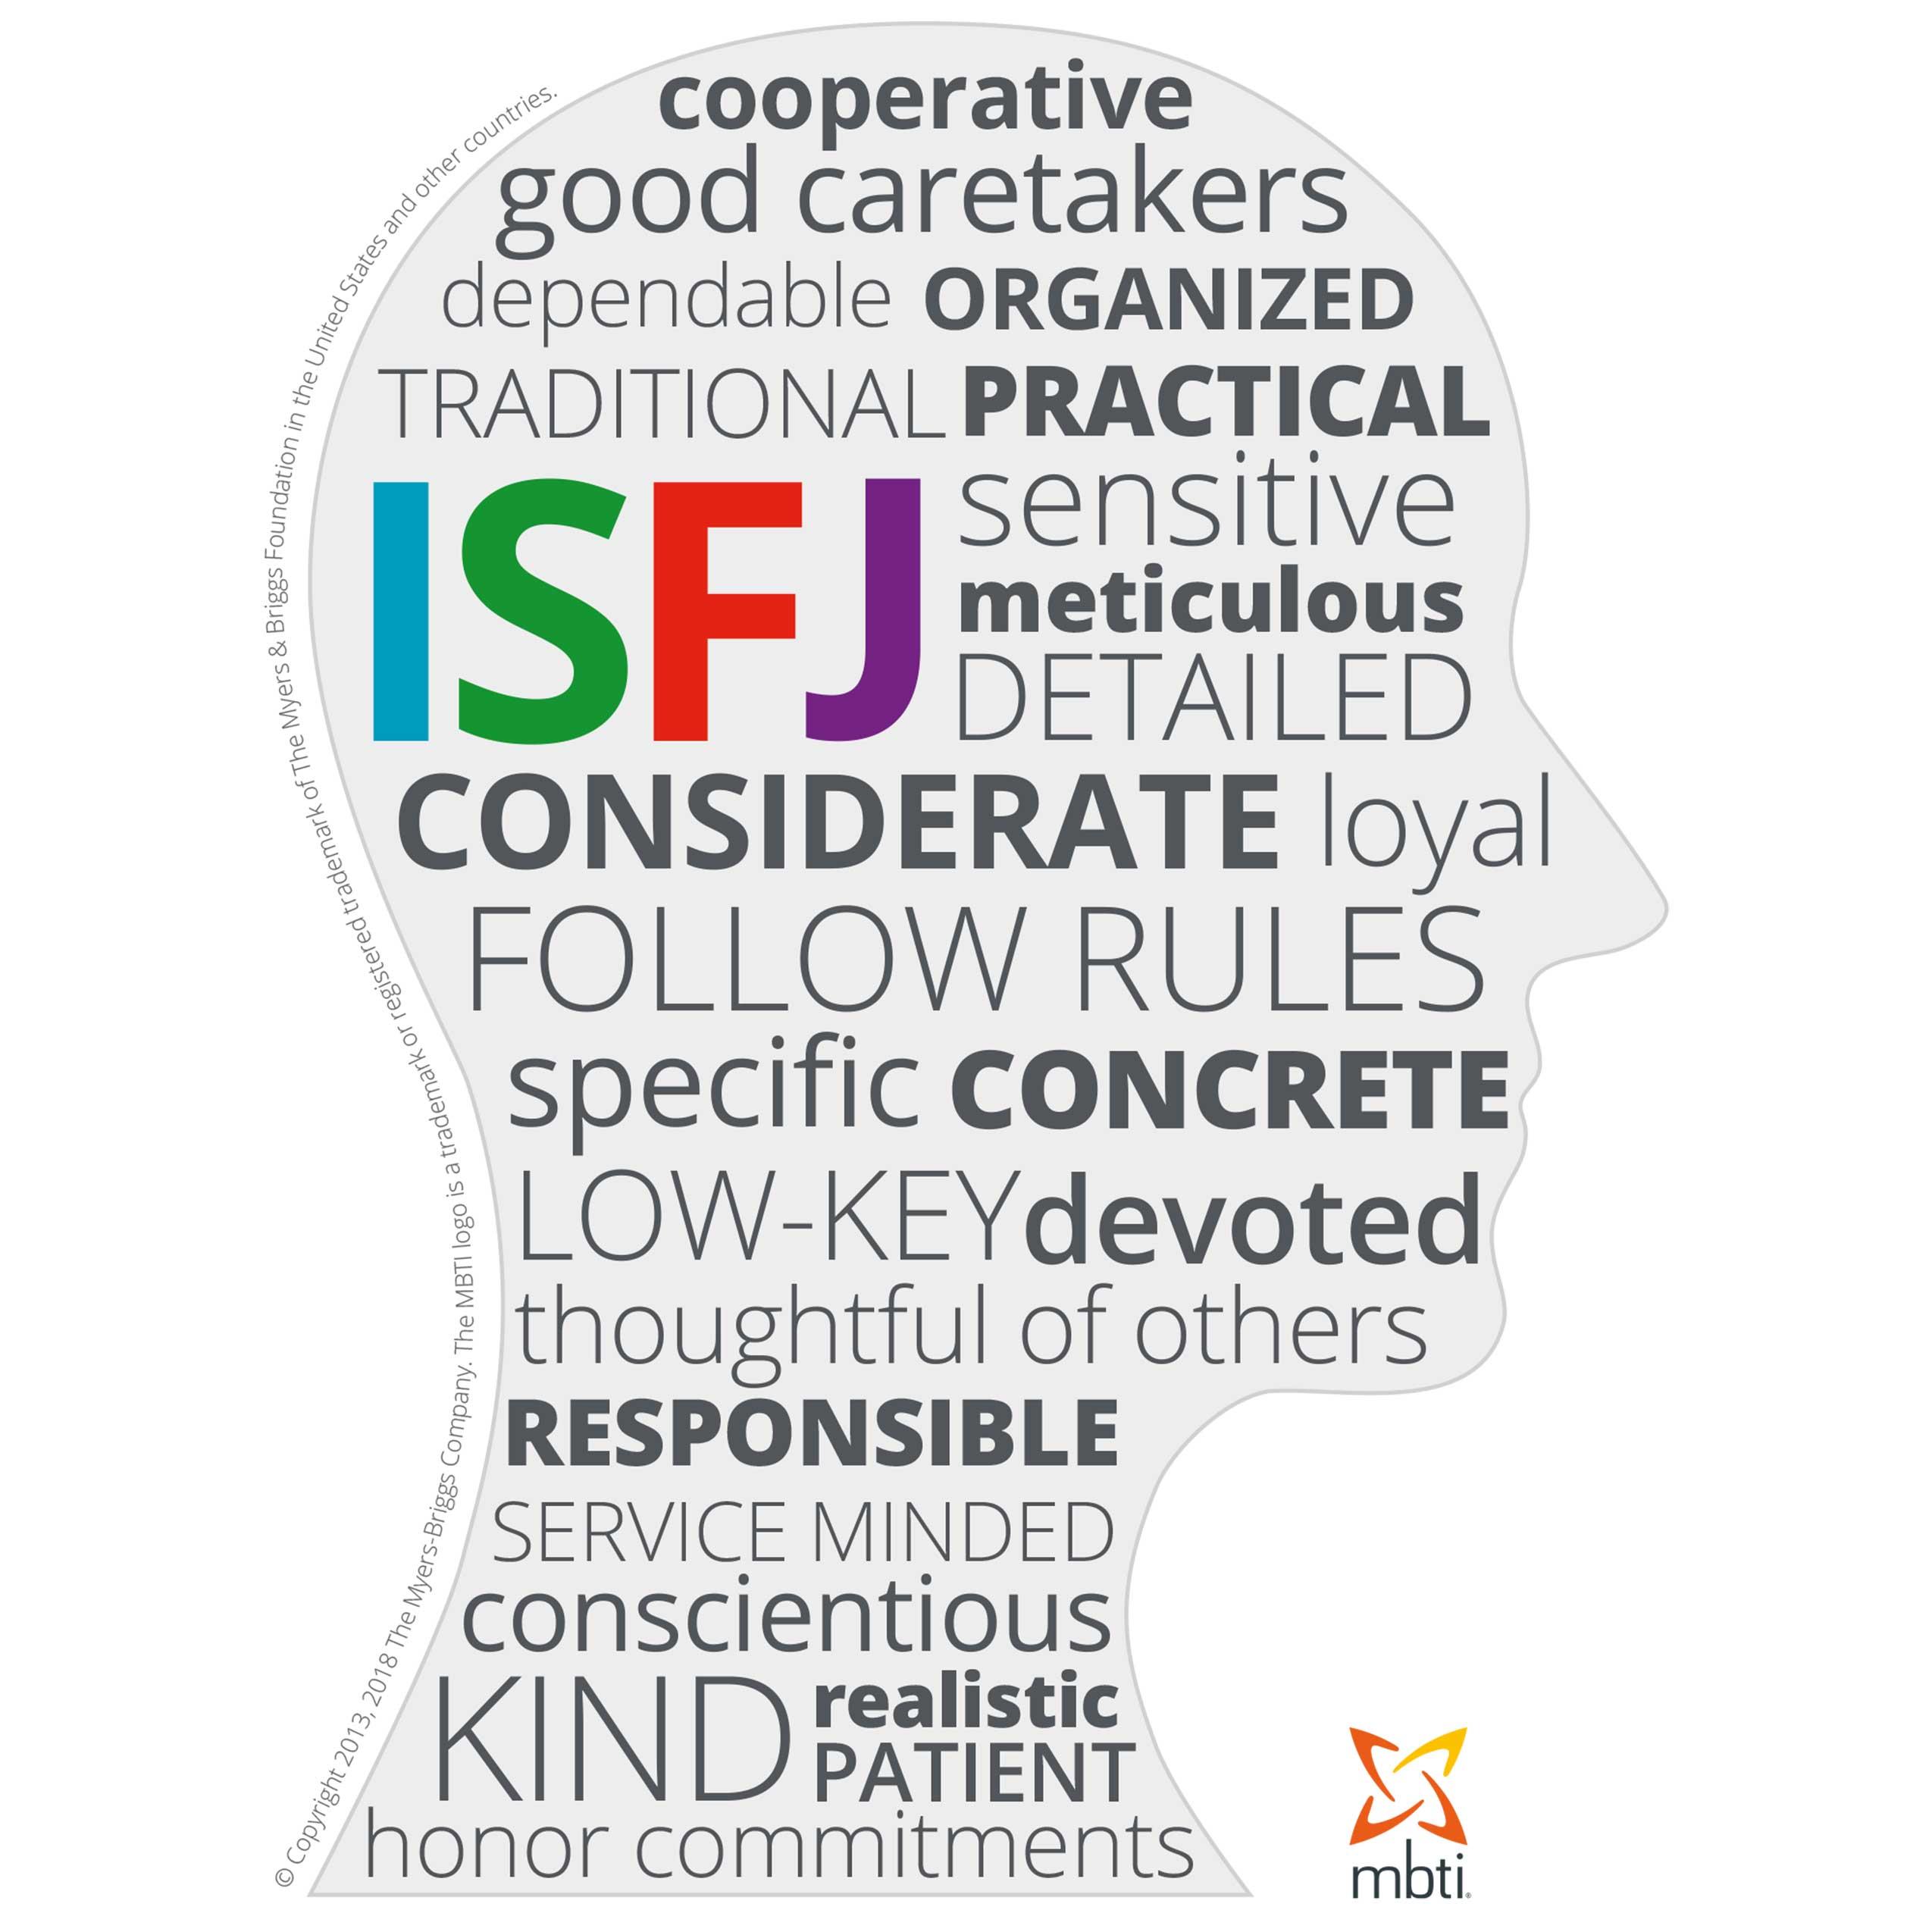 MBTI Myers-Briggs Personality Type Characteristics ISFJ